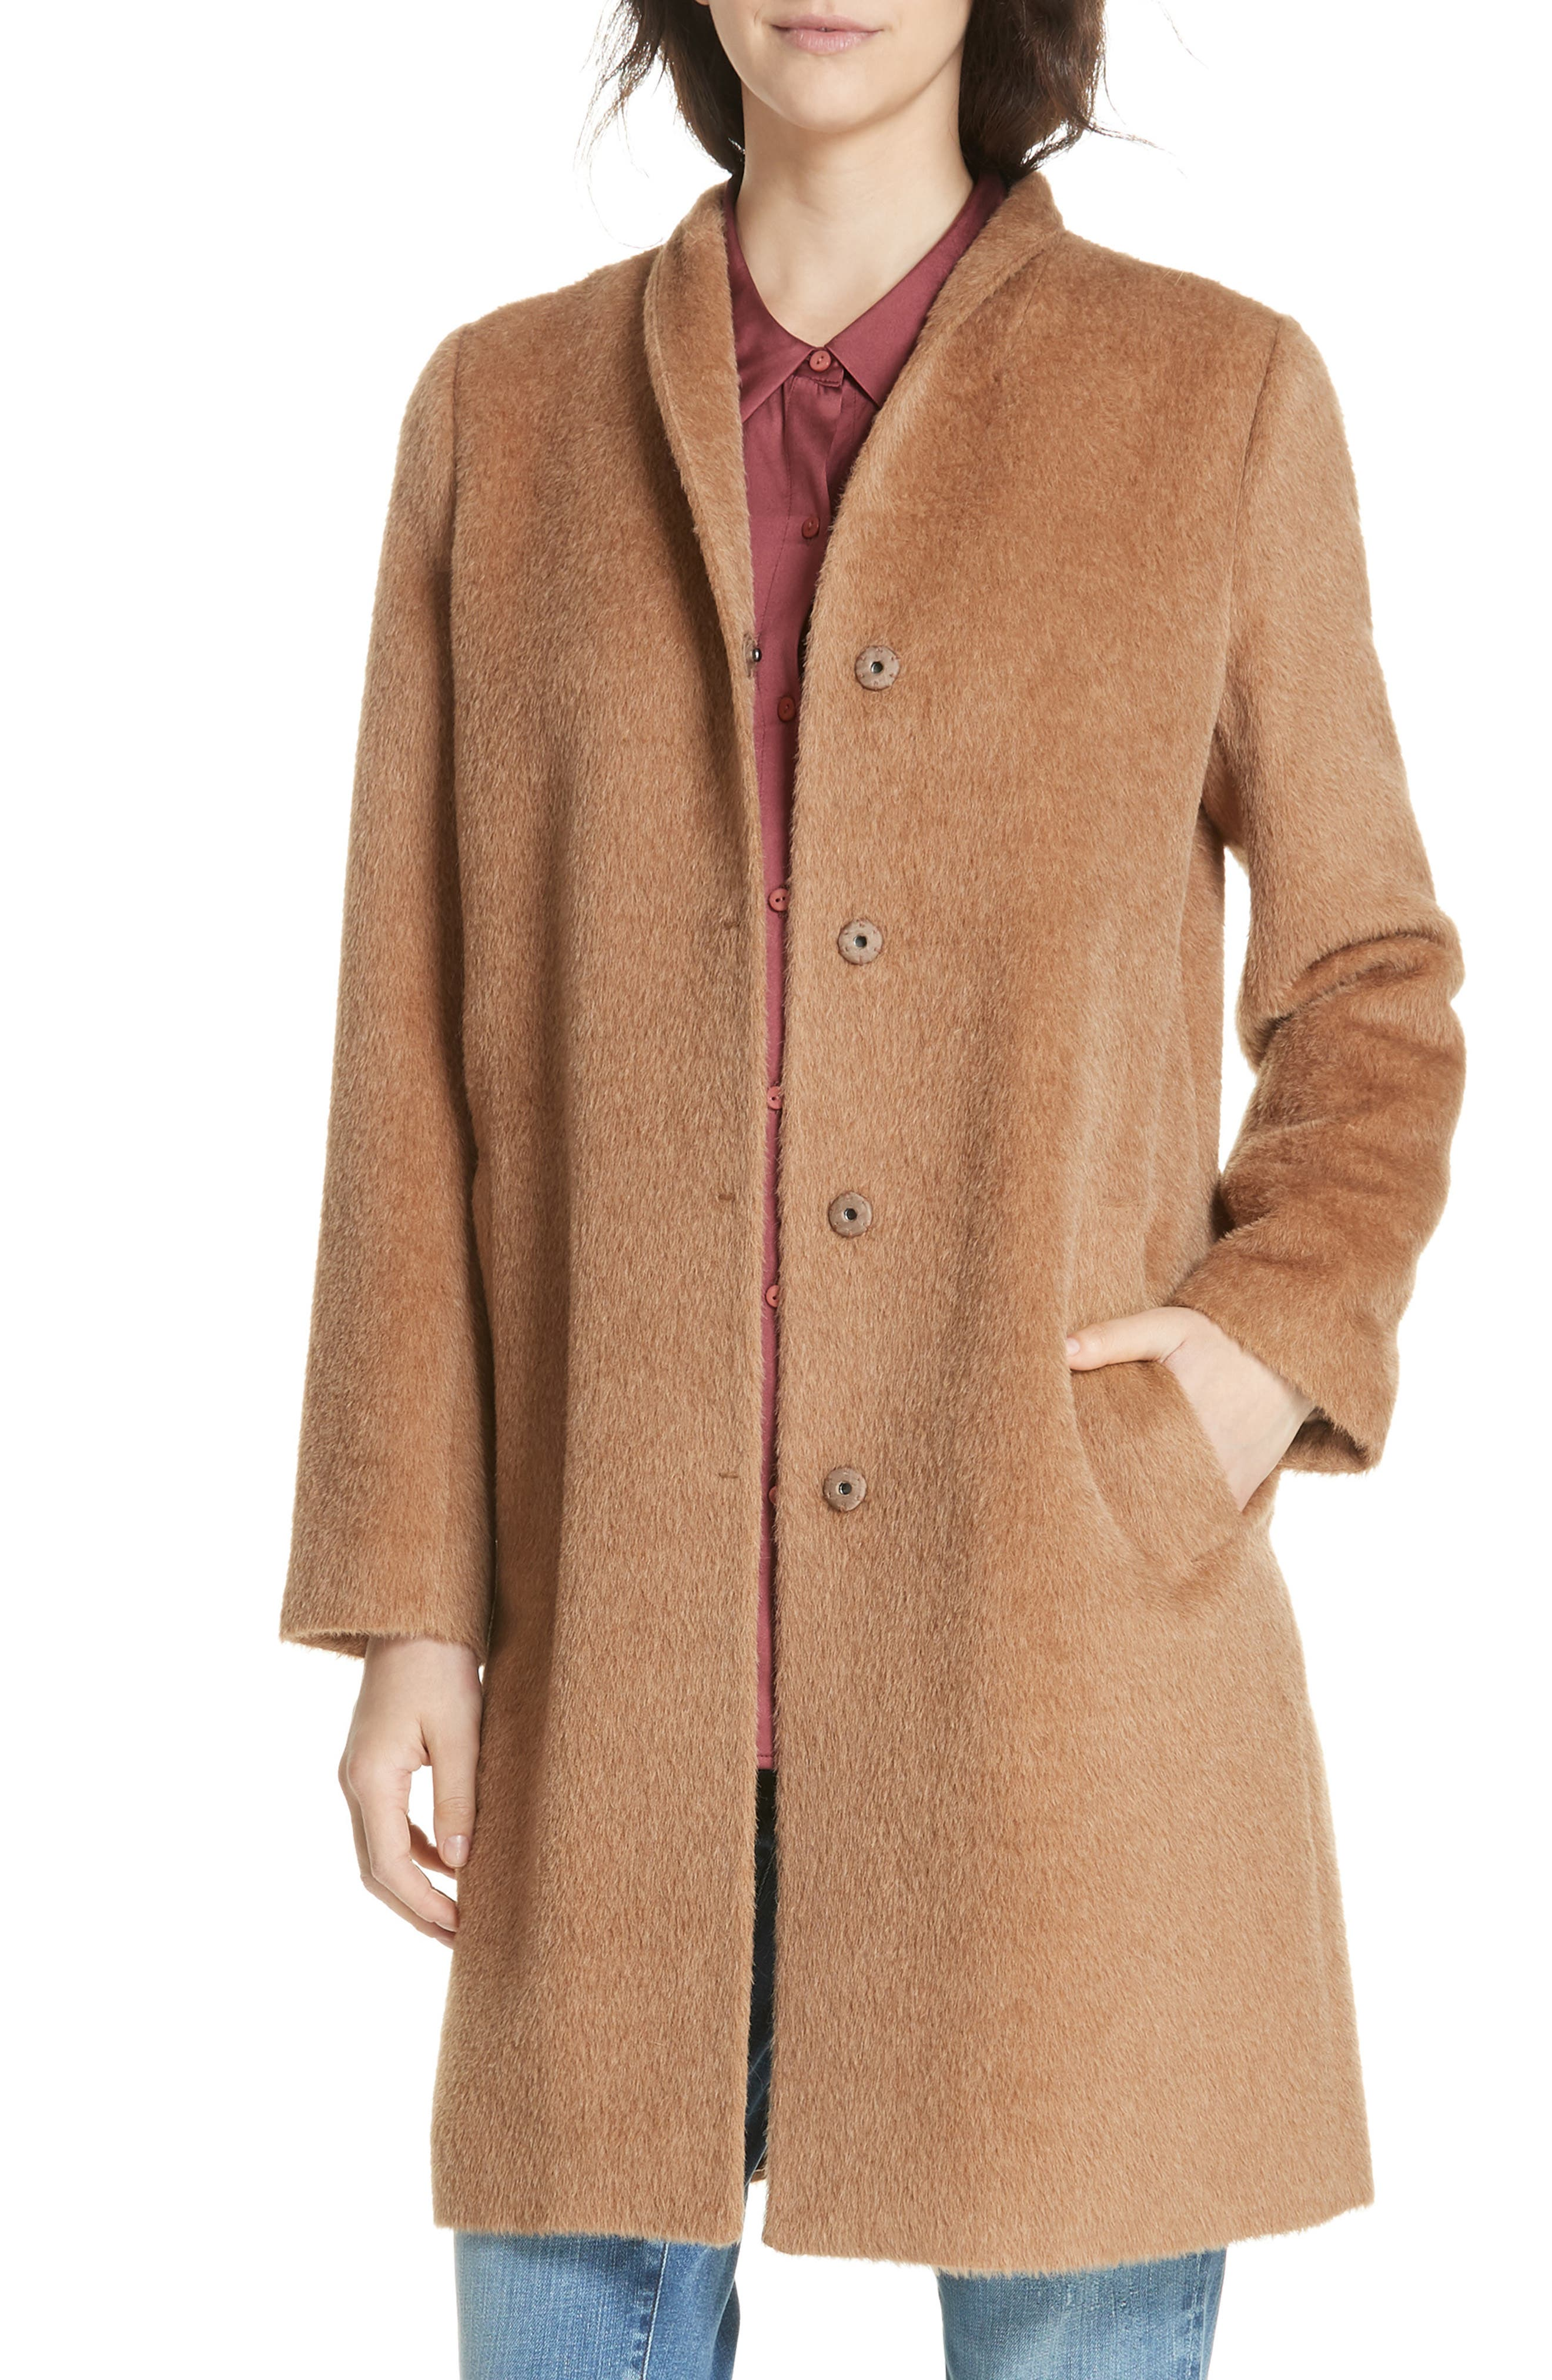 1940s Coats & Jackets Fashion History Womens Eileen Fisher Suri Alpaca Blend Coat Size XX-Small - Brown $698.00 AT vintagedancer.com